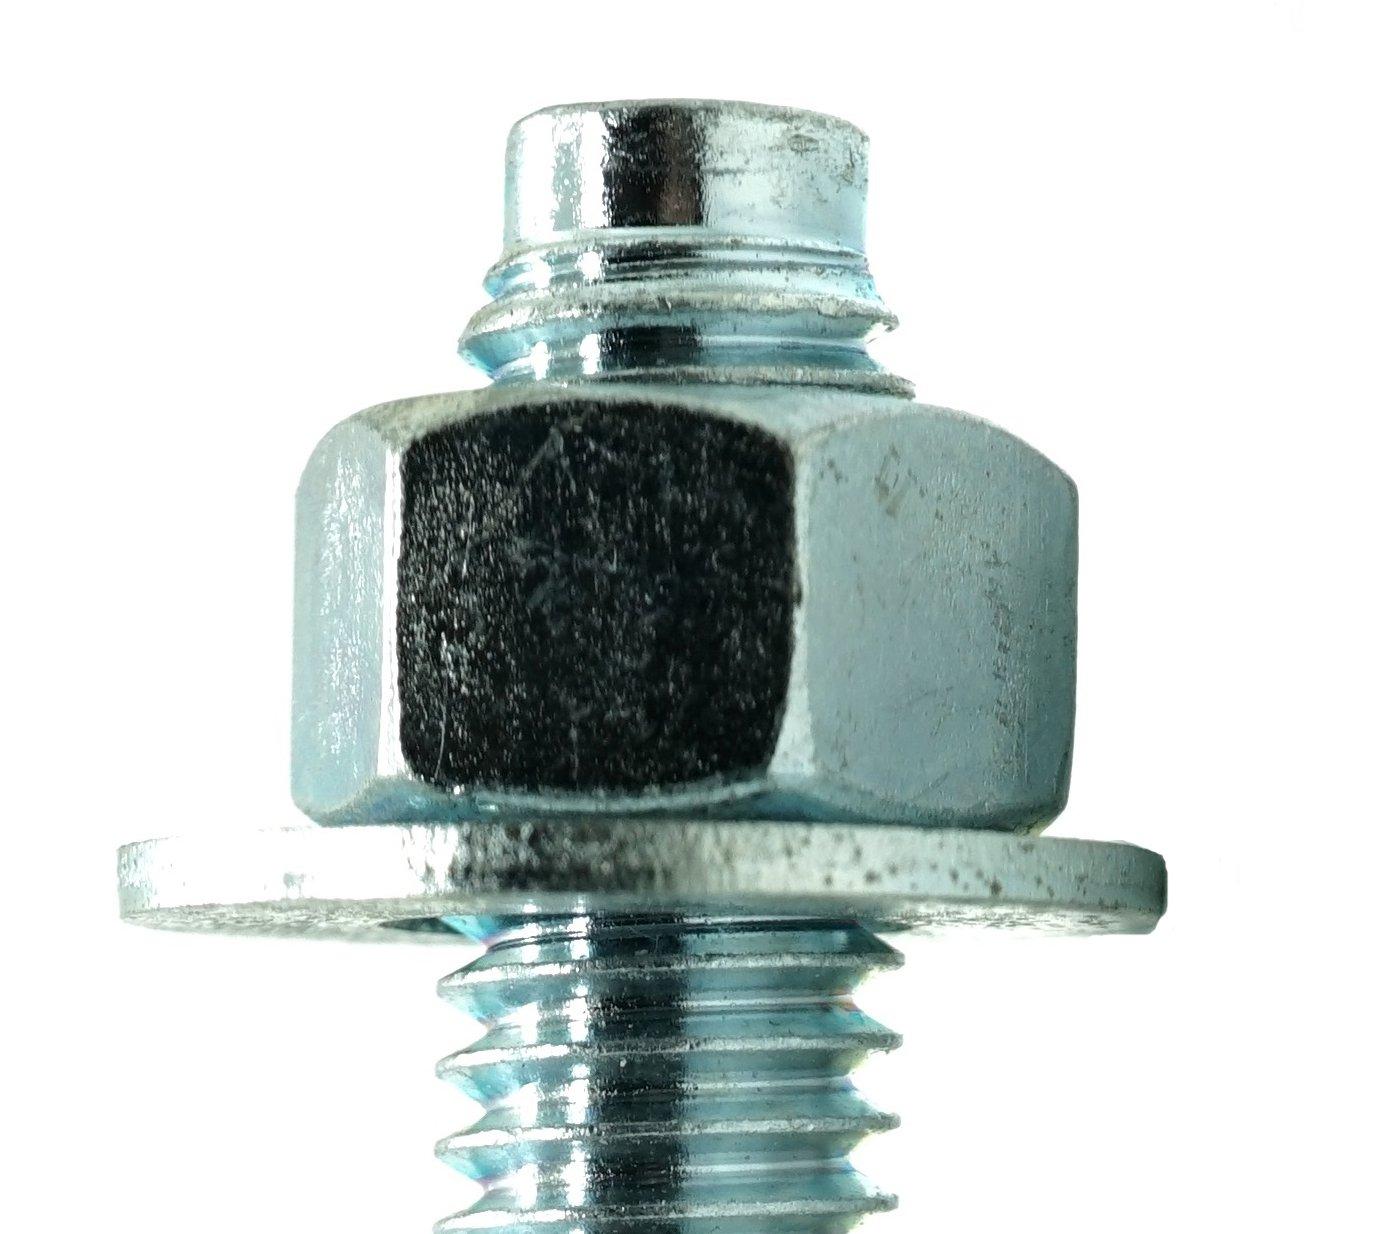 Red Head WS-1244 Trubolt Carbon Steel Wedge 1//2-Inch by 4-1//2-Inch Anchor 25 per Box